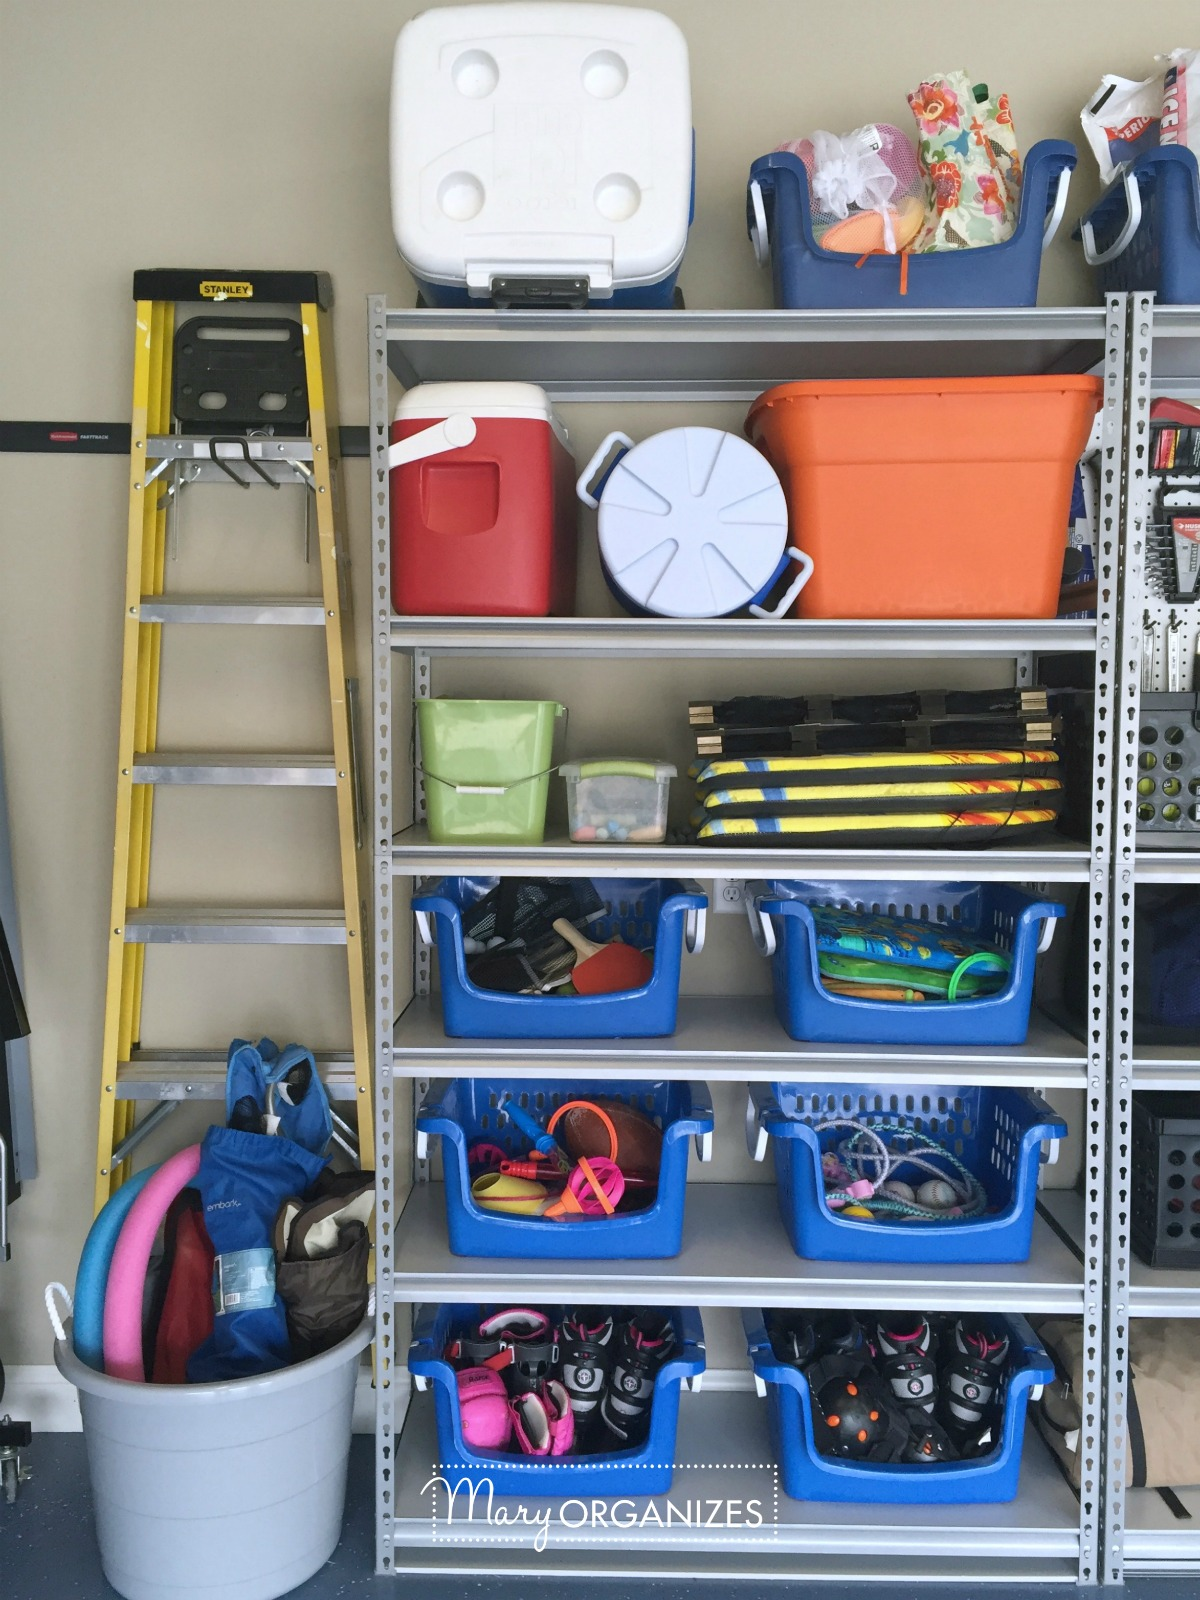 Pegboard Hack And Organizing Garage Shelves 6